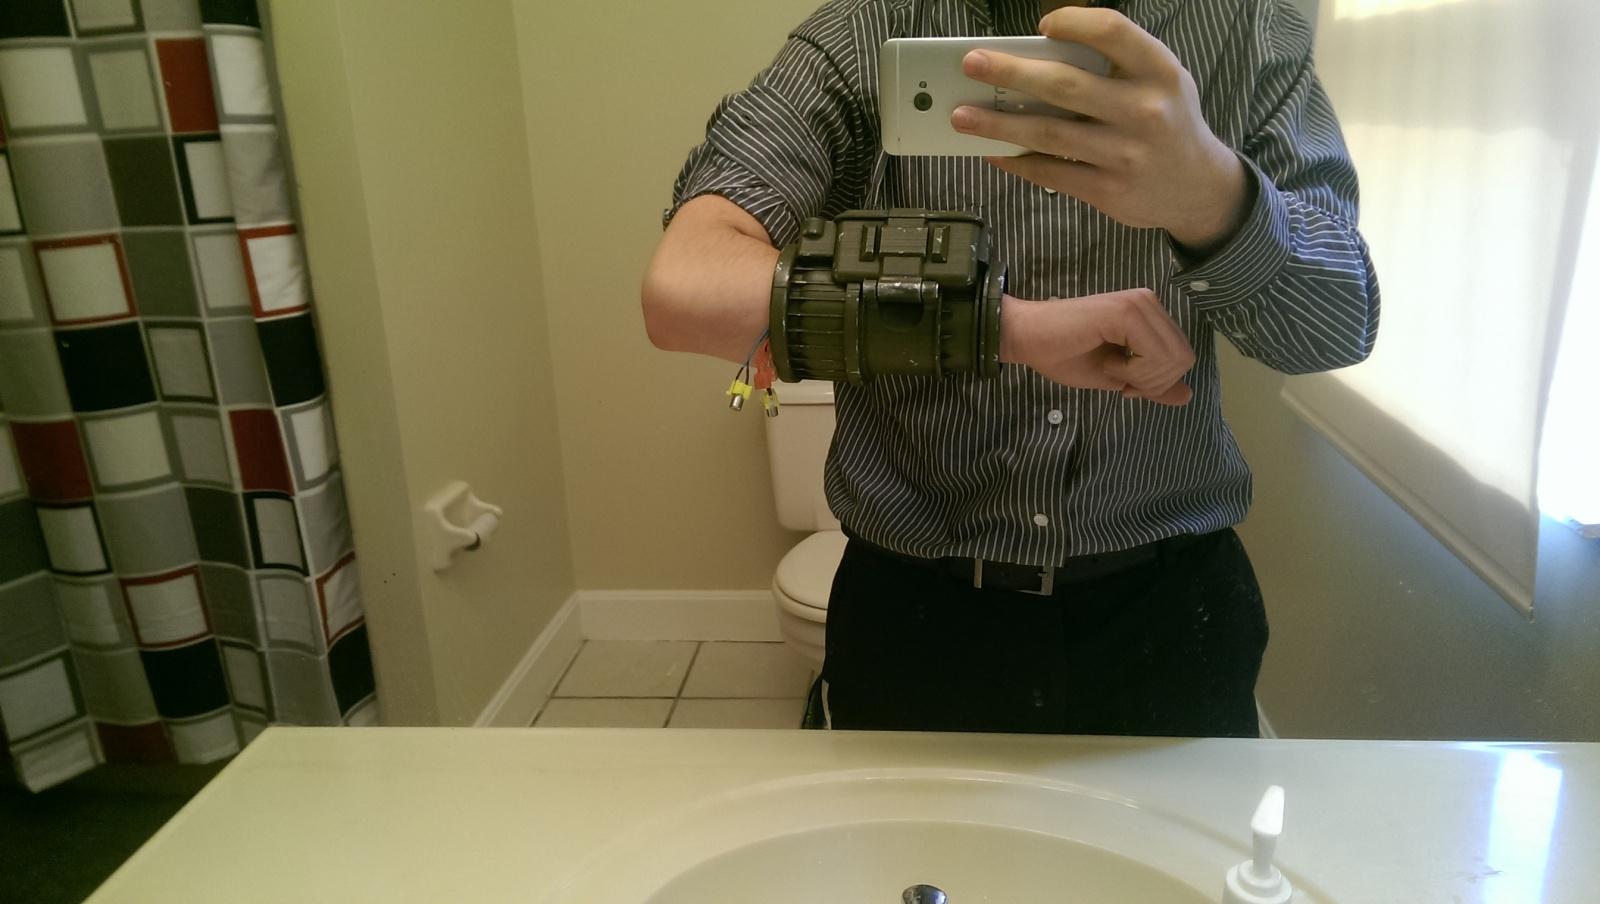 PipBoy из Fallout 3 на Raspberry Pi - 3